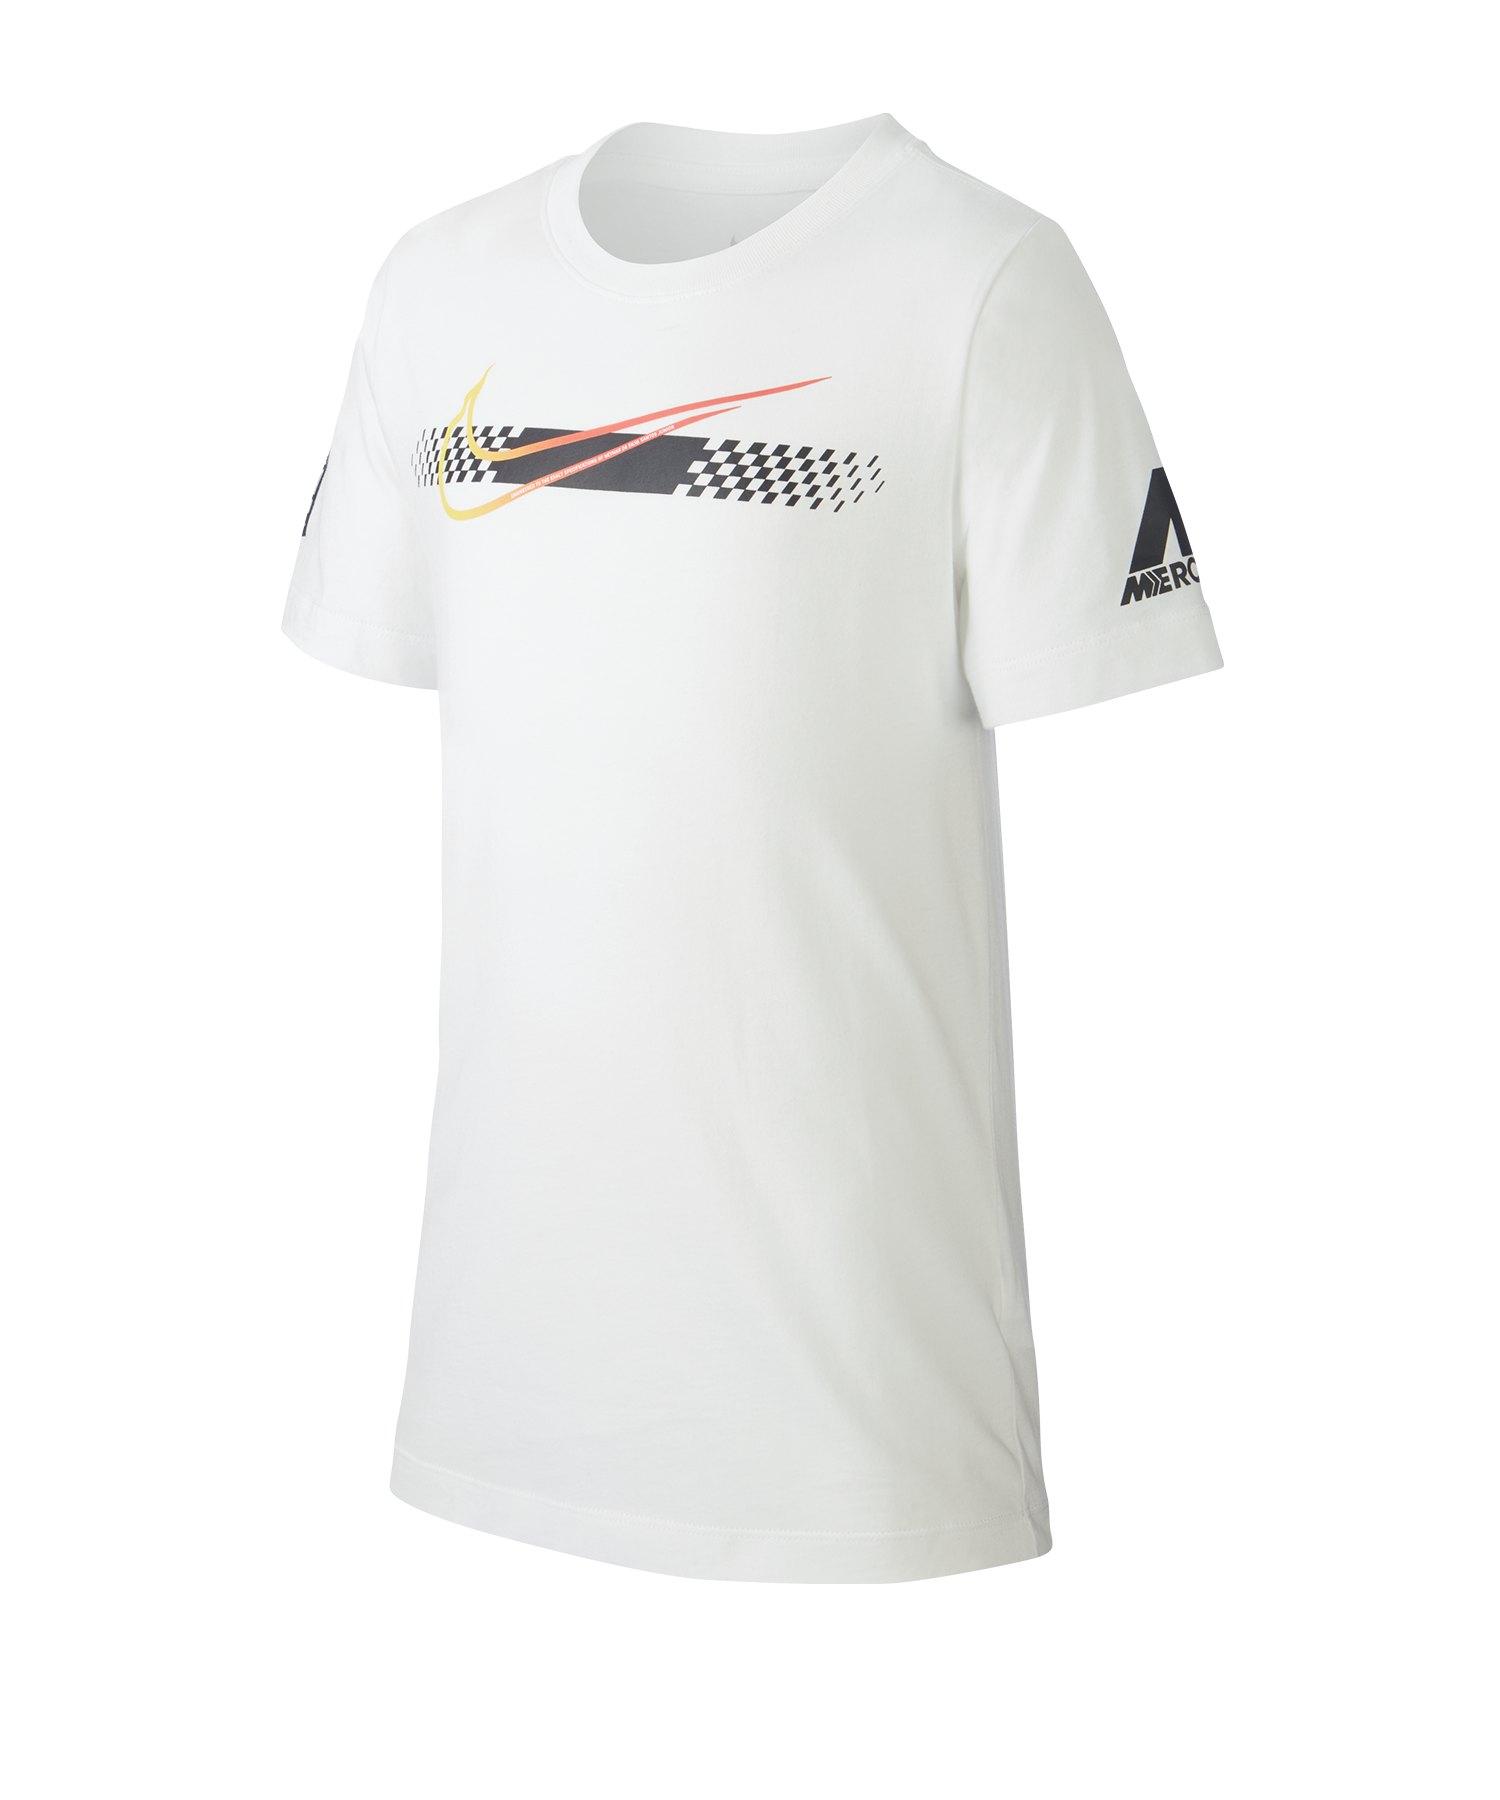 Nike Neymar Jr. Mercurial T-Shirt Kids F100 - weiss